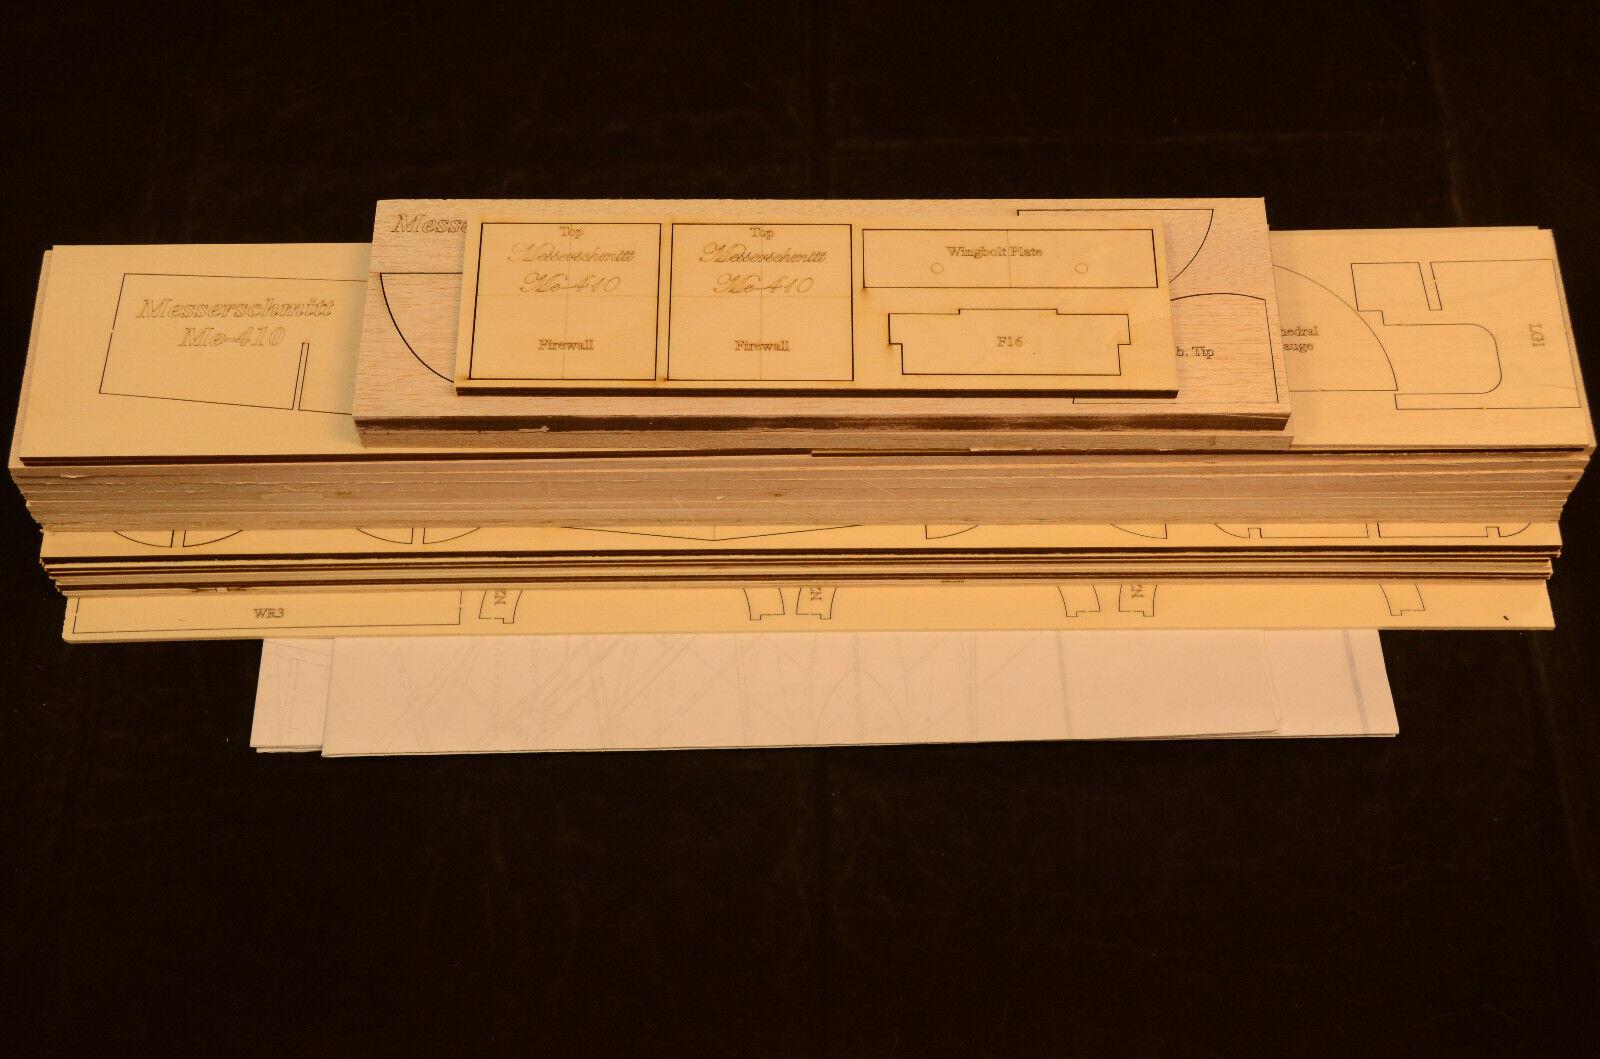 Grande 1 8 Escala Kit Kit Kit De Corte Láser ME-410 Messerschmitt corto, planos y Inst. 81 WS  ventas de salida